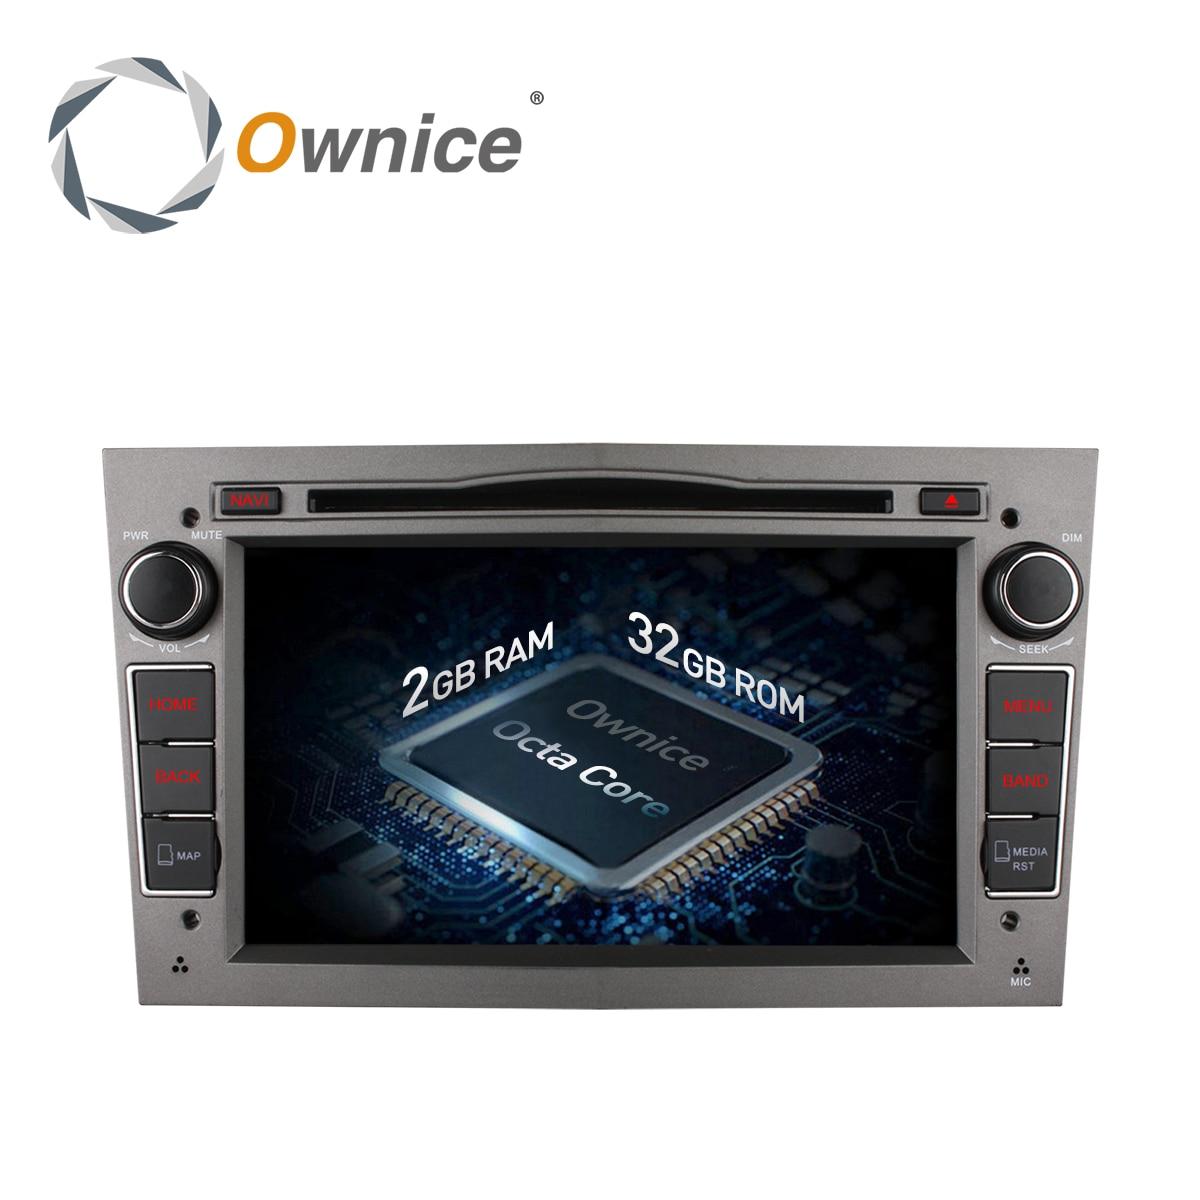 imágenes para Ownice C500 Octa Core Android 6.0 32G ROM GPS Coches Reproductor de DVD para Vauxhall Opel VECTRA ZAFIRA Antara Astra H G J Soporte 4G LTE